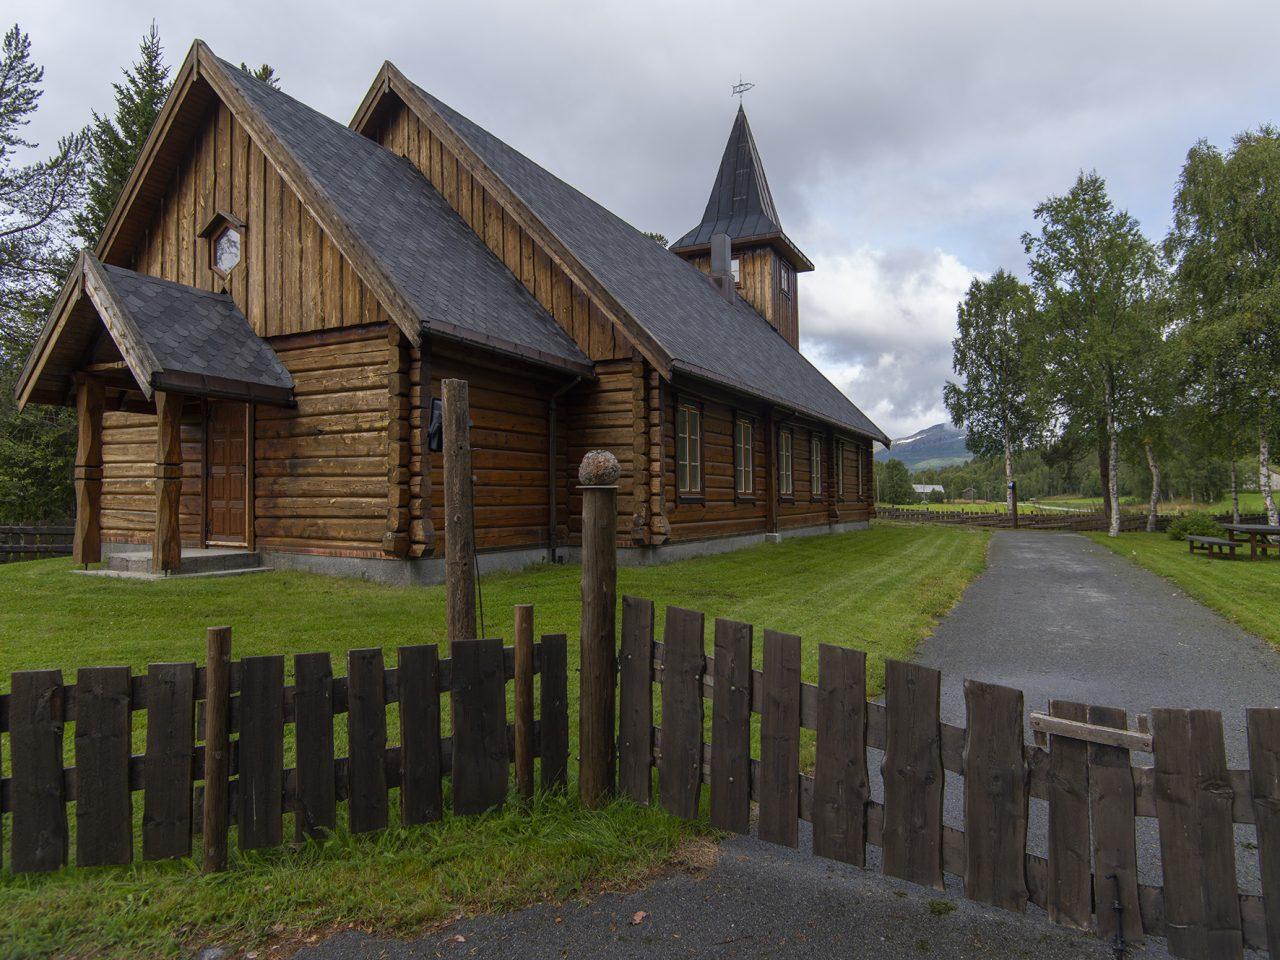 Hattfjelldal. Susendal kirke